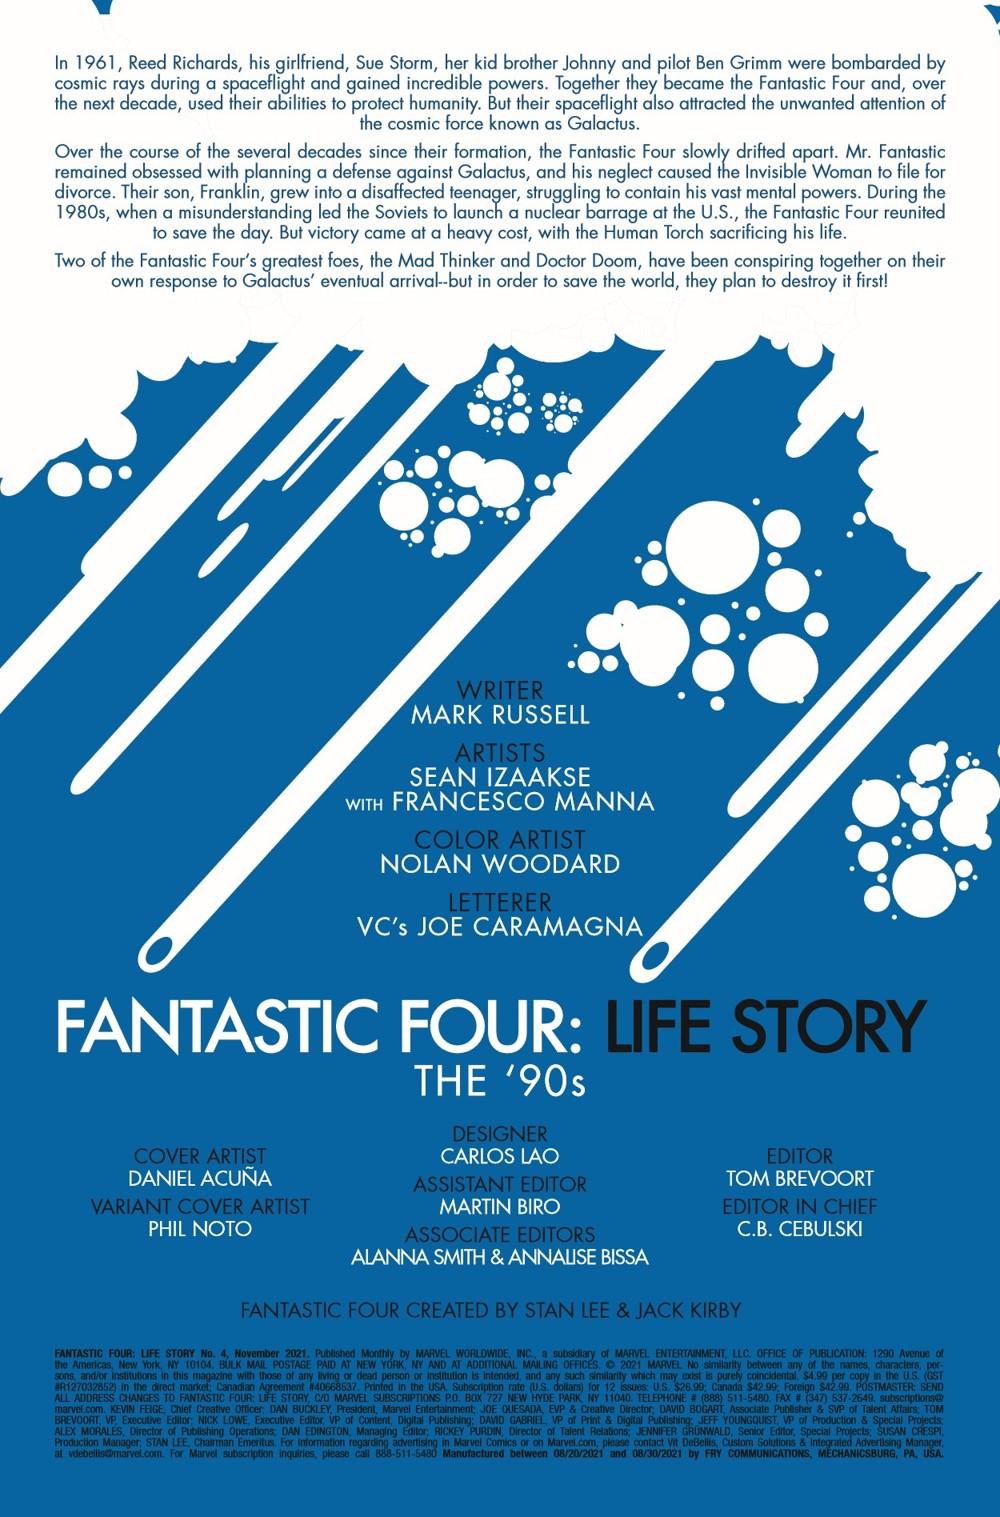 FFLIFESTORY2019004_Preview-2 ComicList Previews: FANTASTIC FOUR LIFE STORY #4 (OF 6)